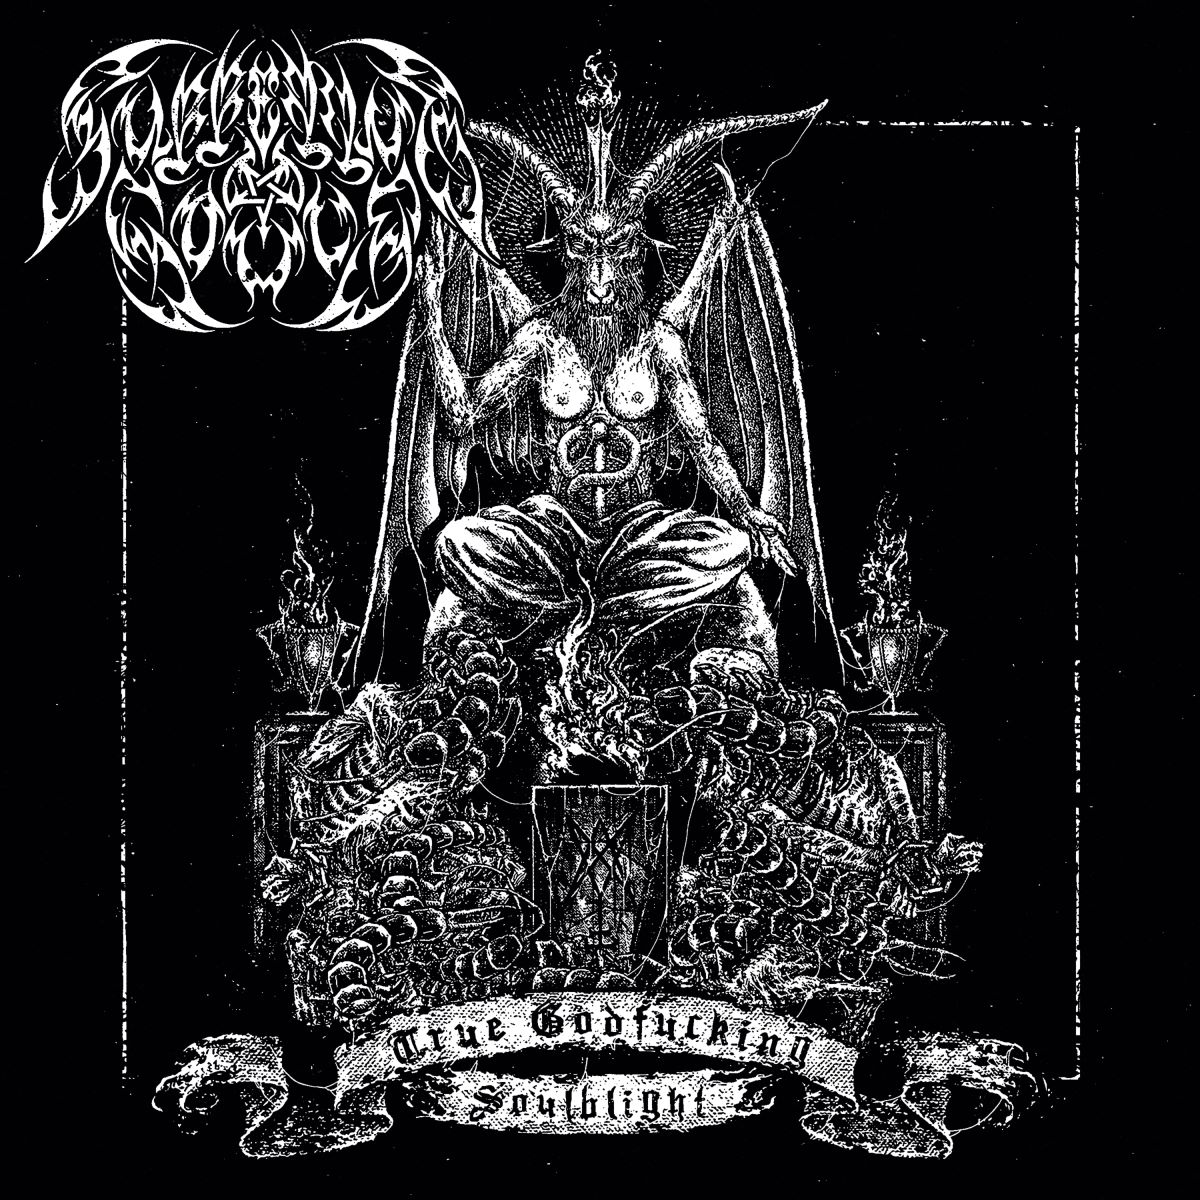 suffering souls - True Godfucking Soulblight - album cover